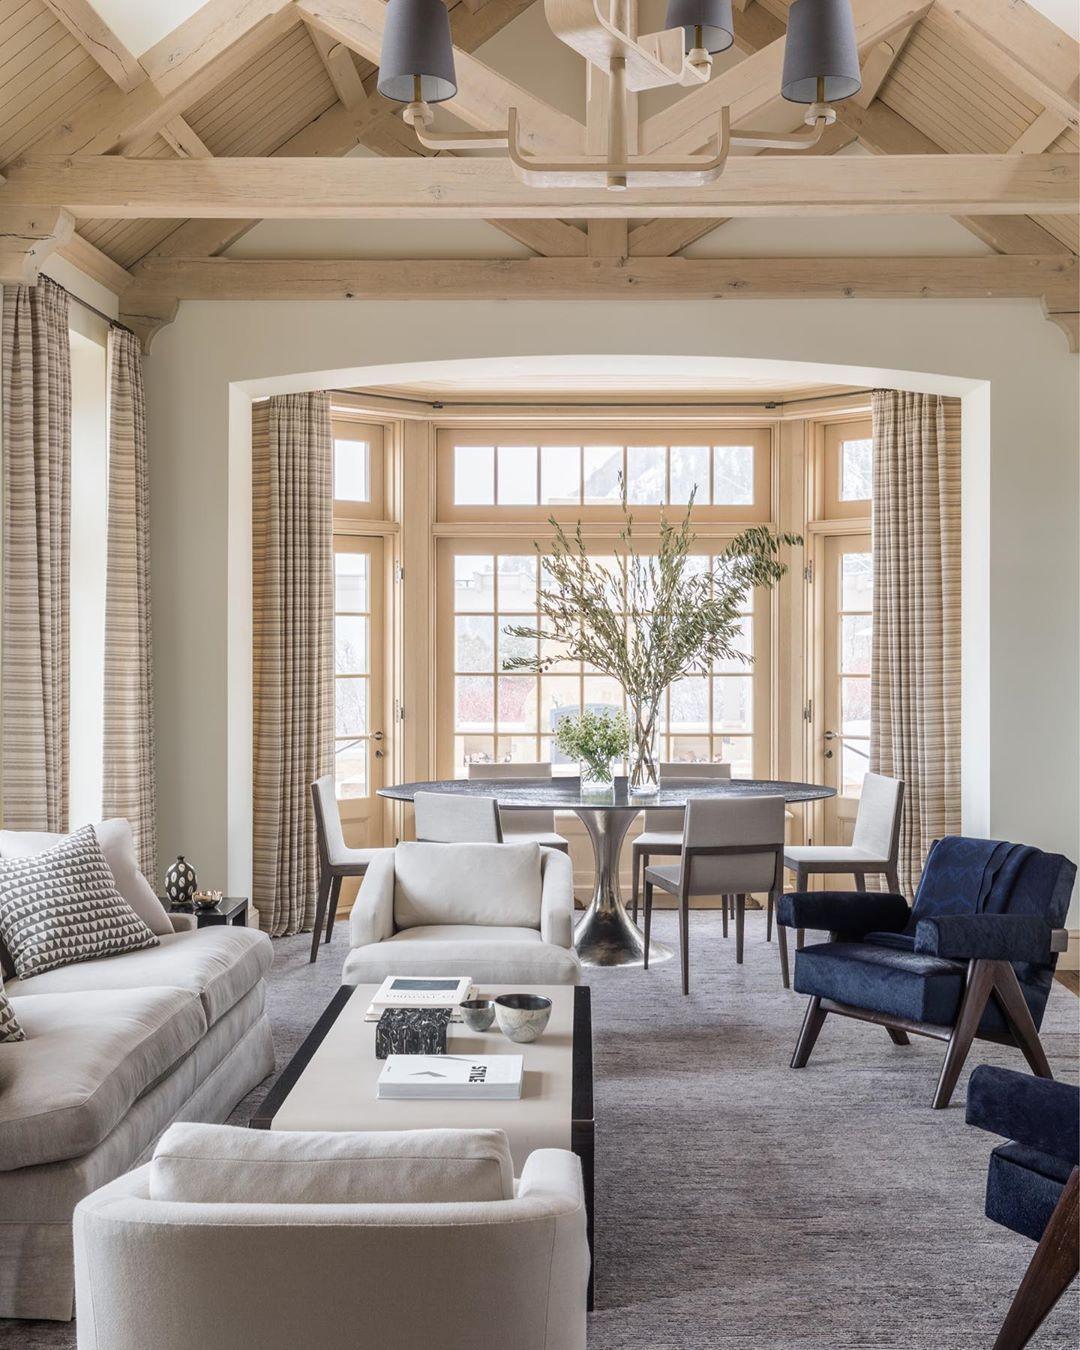 Victoria Hagan On Instagram Aspen Casual Aspenlight Aspenair Breathe Cozy Family Rooms Family Room Living Room Lounge